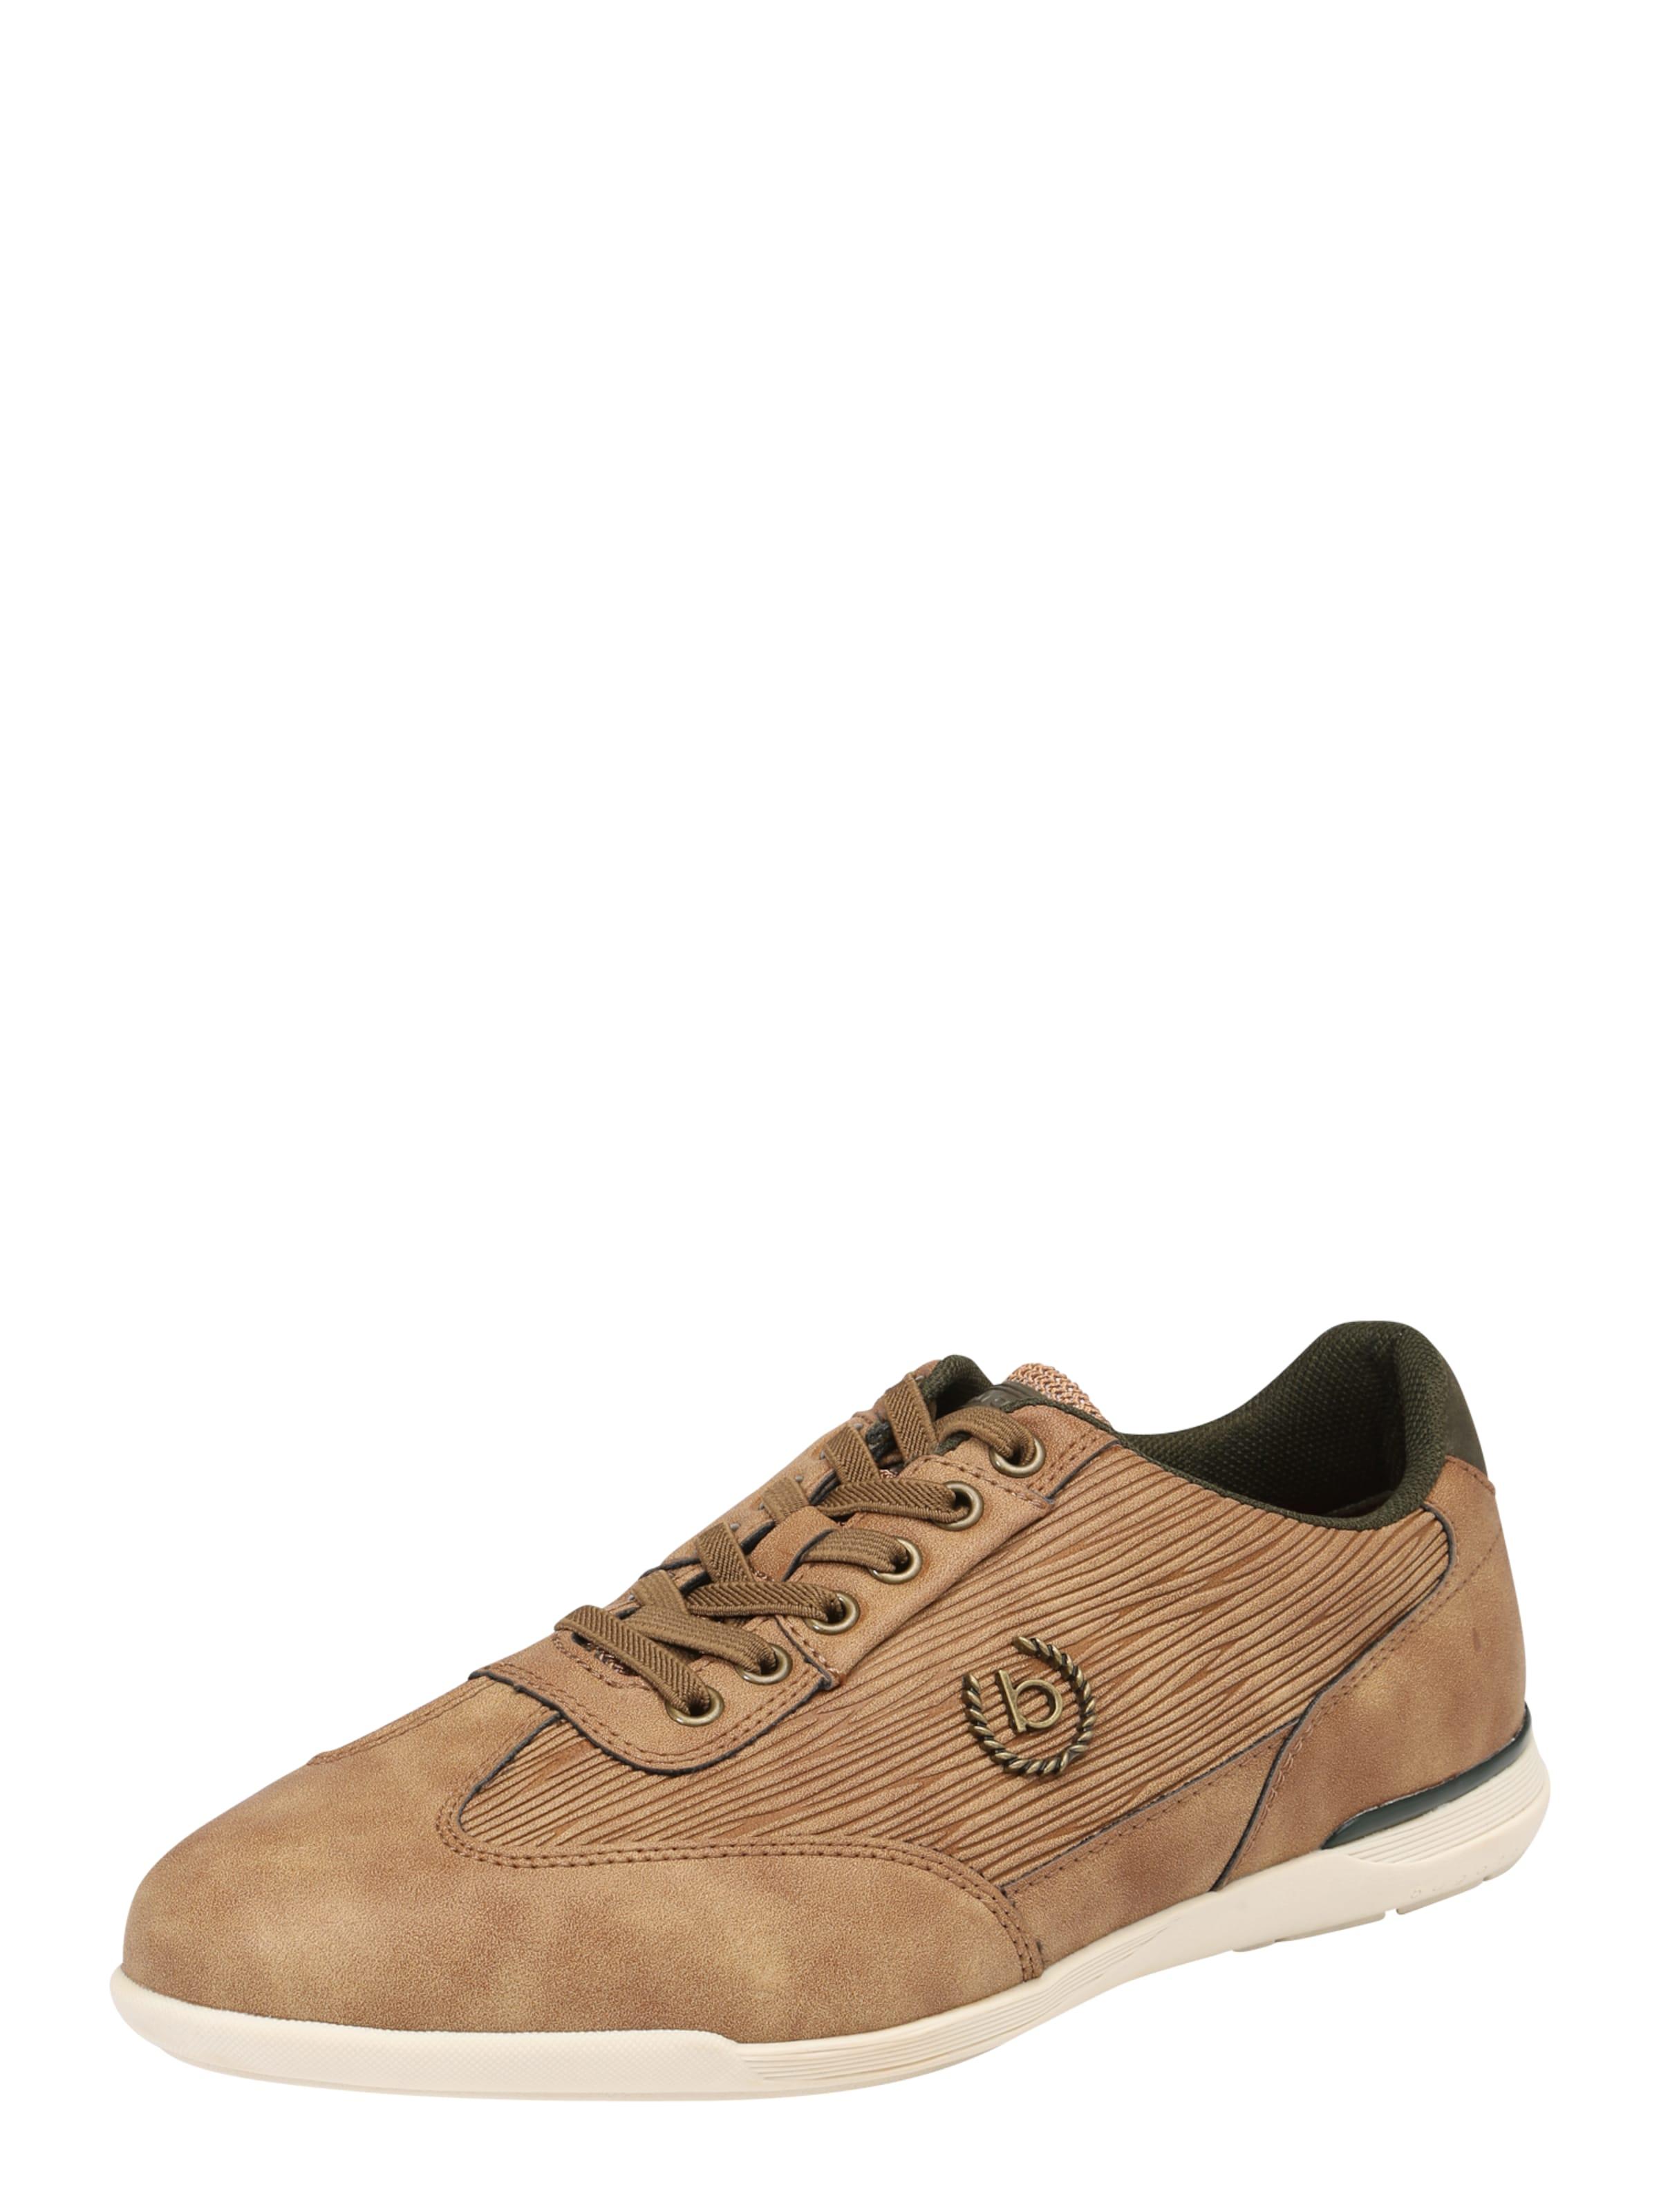 bugatti Sneaker River Evo Verschleißfeste Schuhe billige Schuhe Verschleißfeste 2580e8